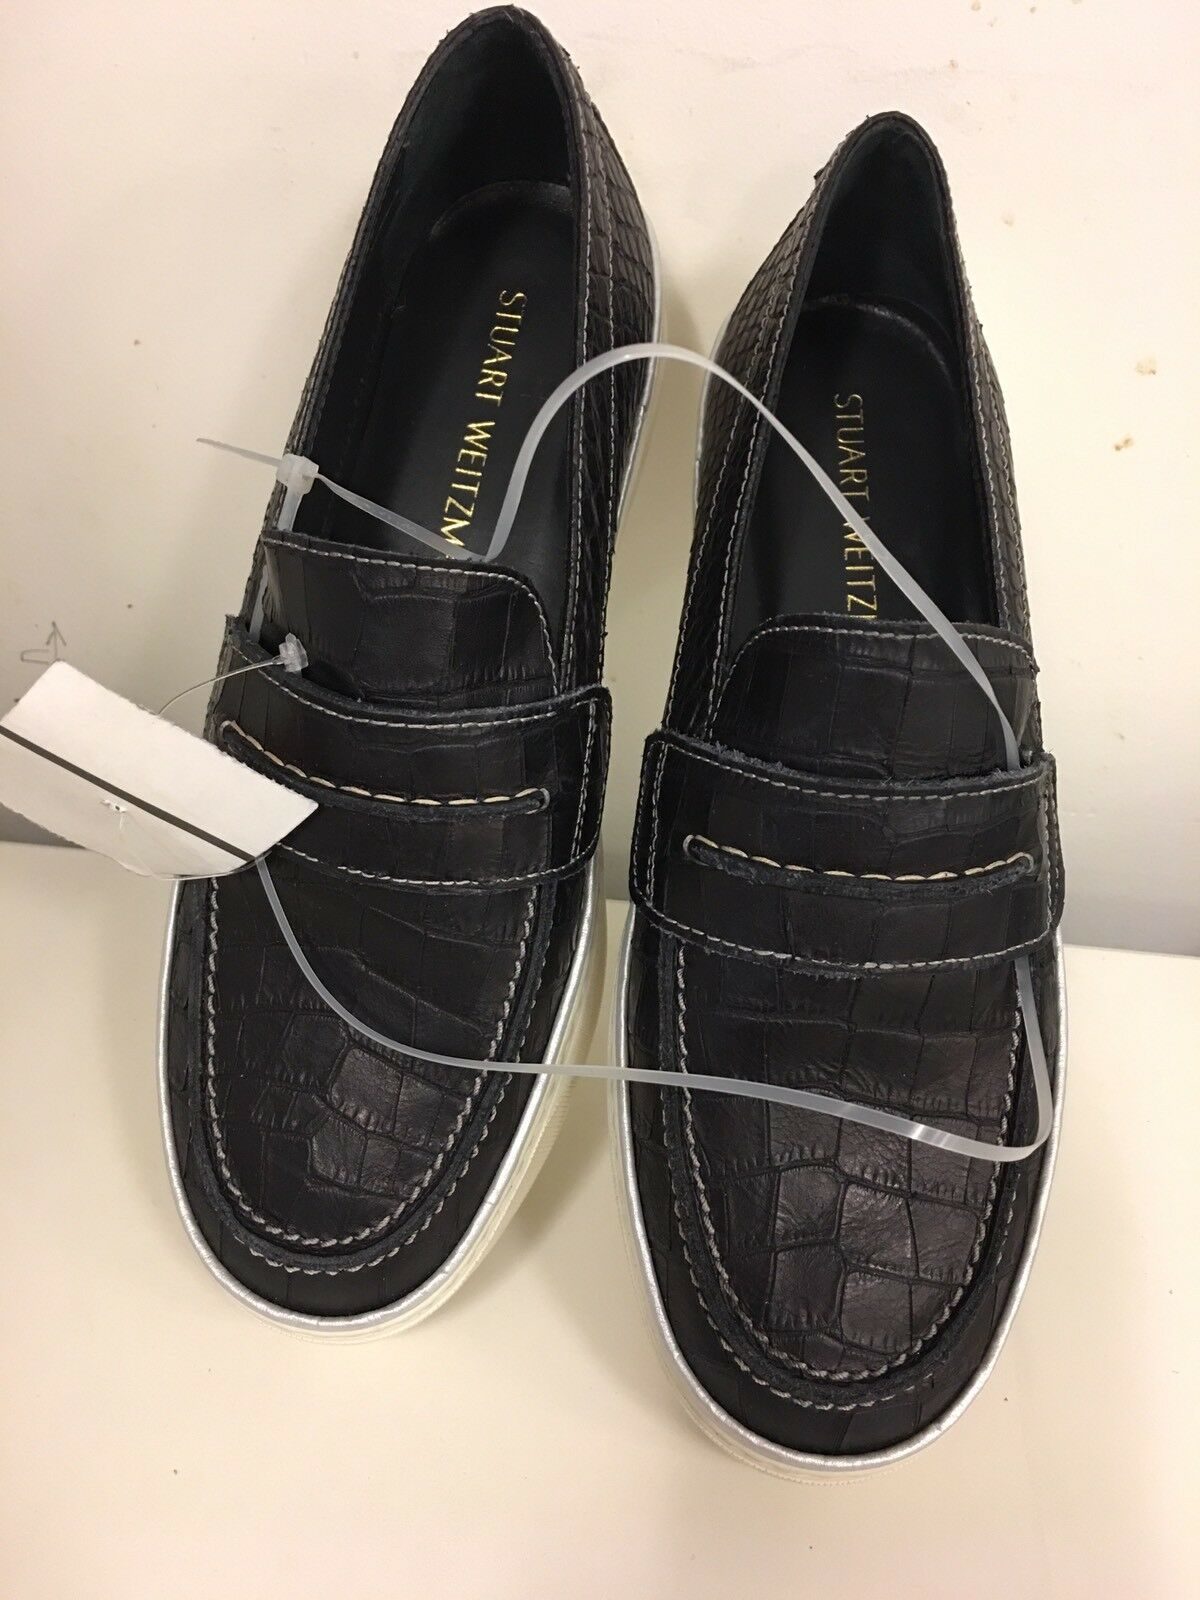 New Stuart Weitzman Lounge Slip On Loafer scarpe da ginnastica Nero Croco 7.5 38